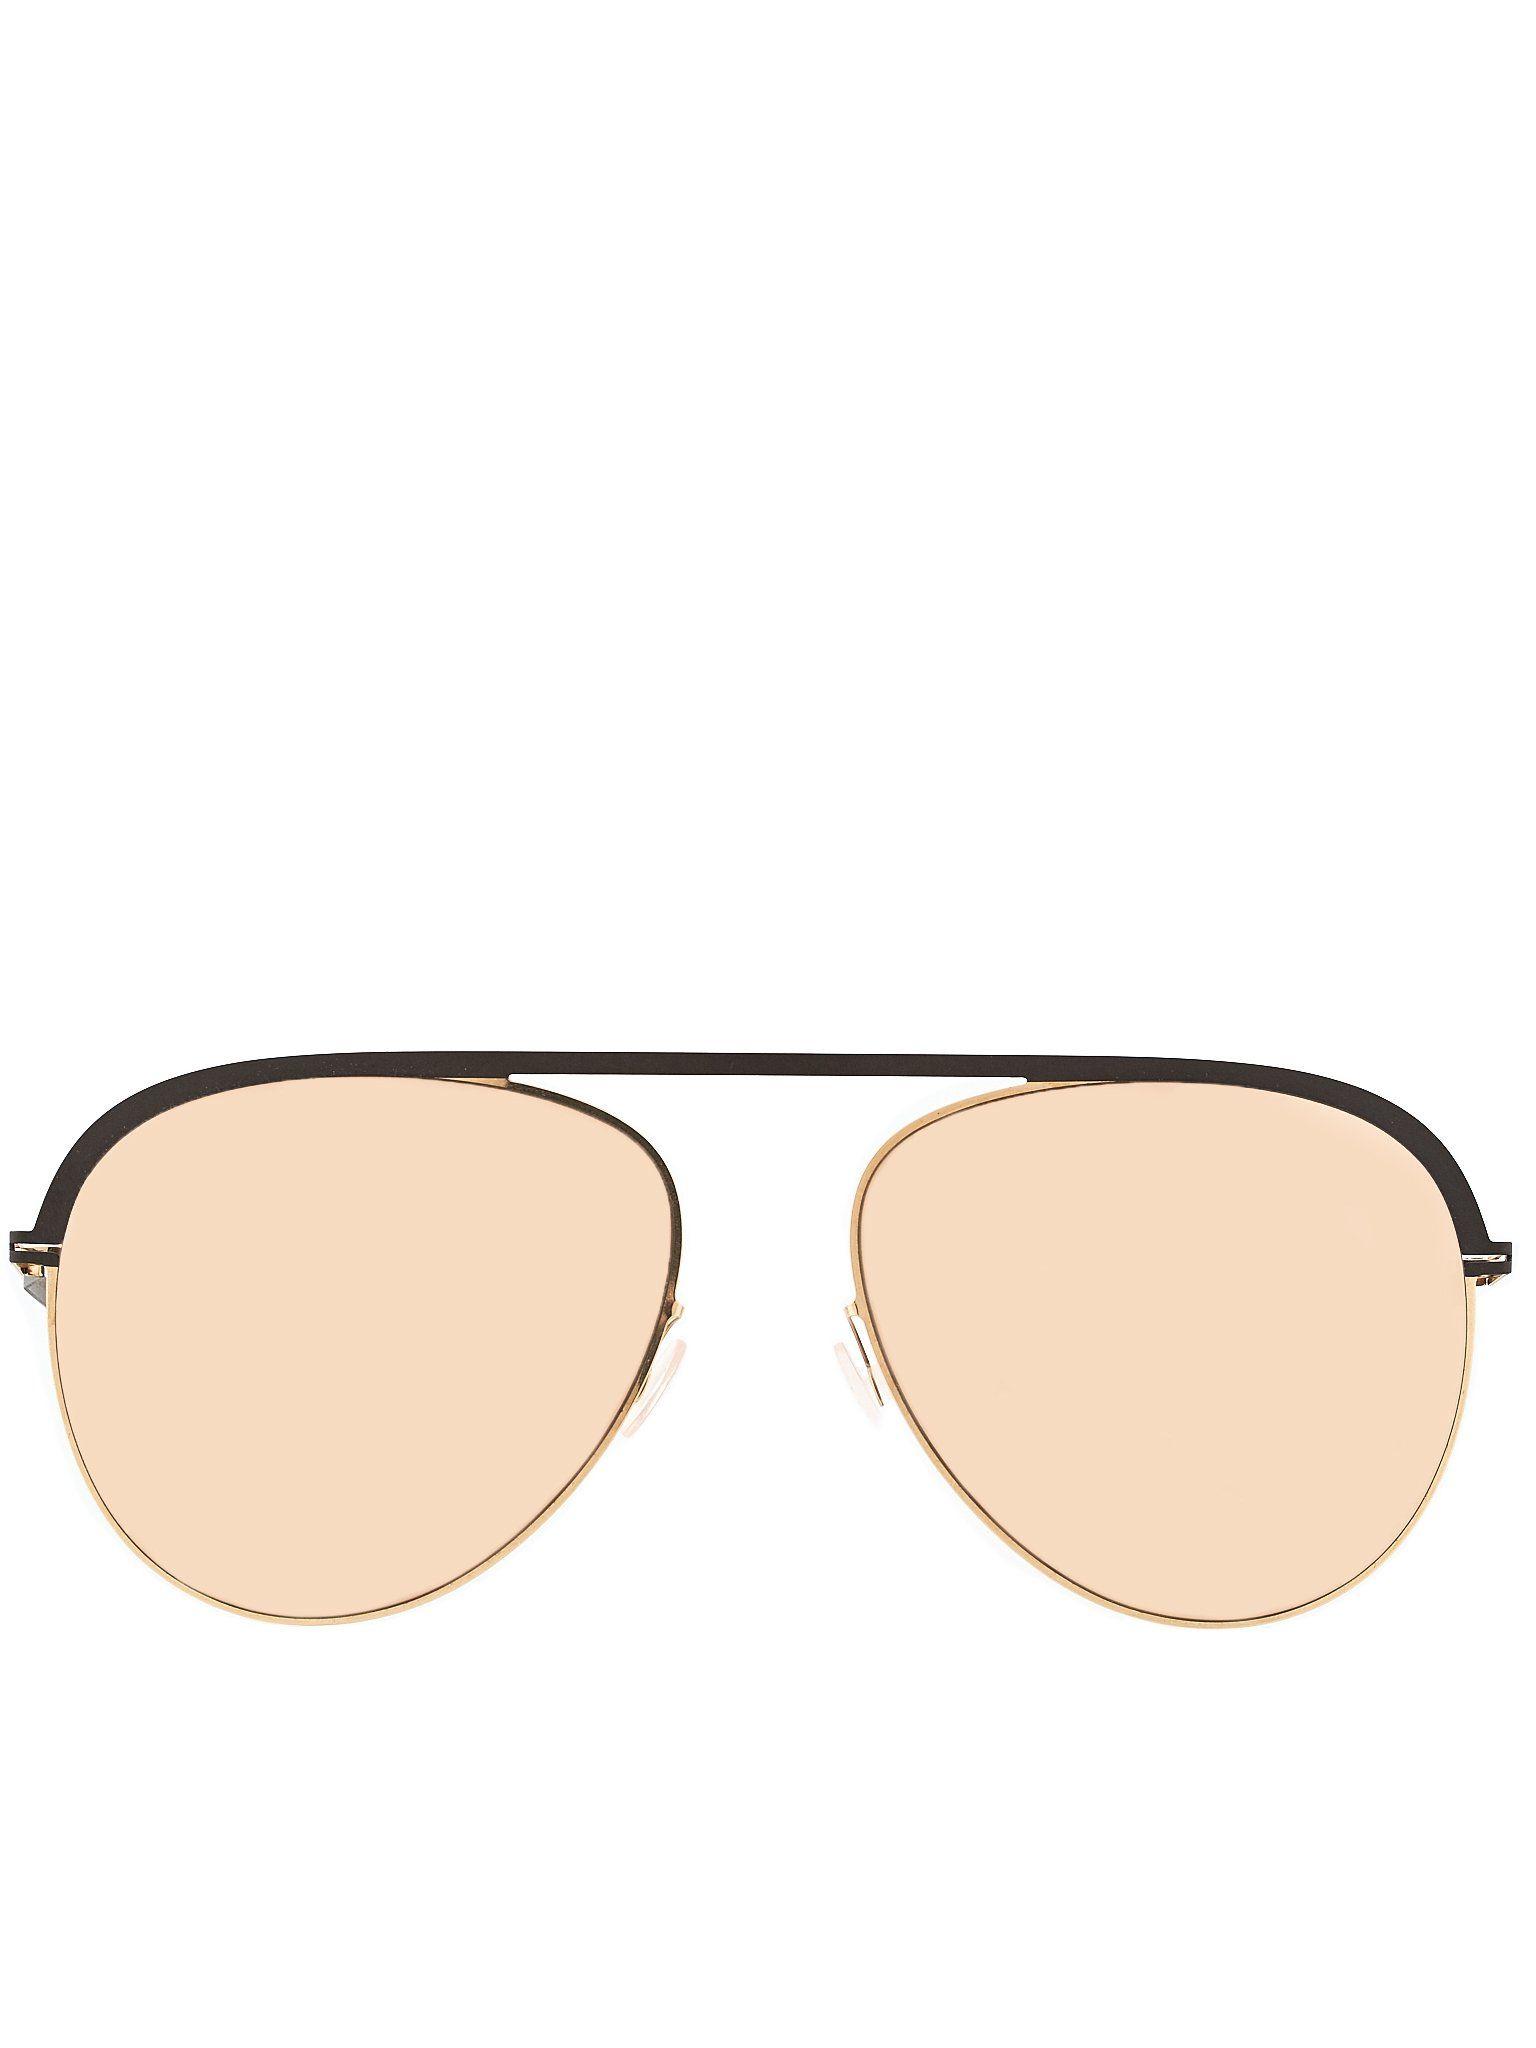 68f6748102 Mykita -  Onno  Aviator Sunglasses -  519.00